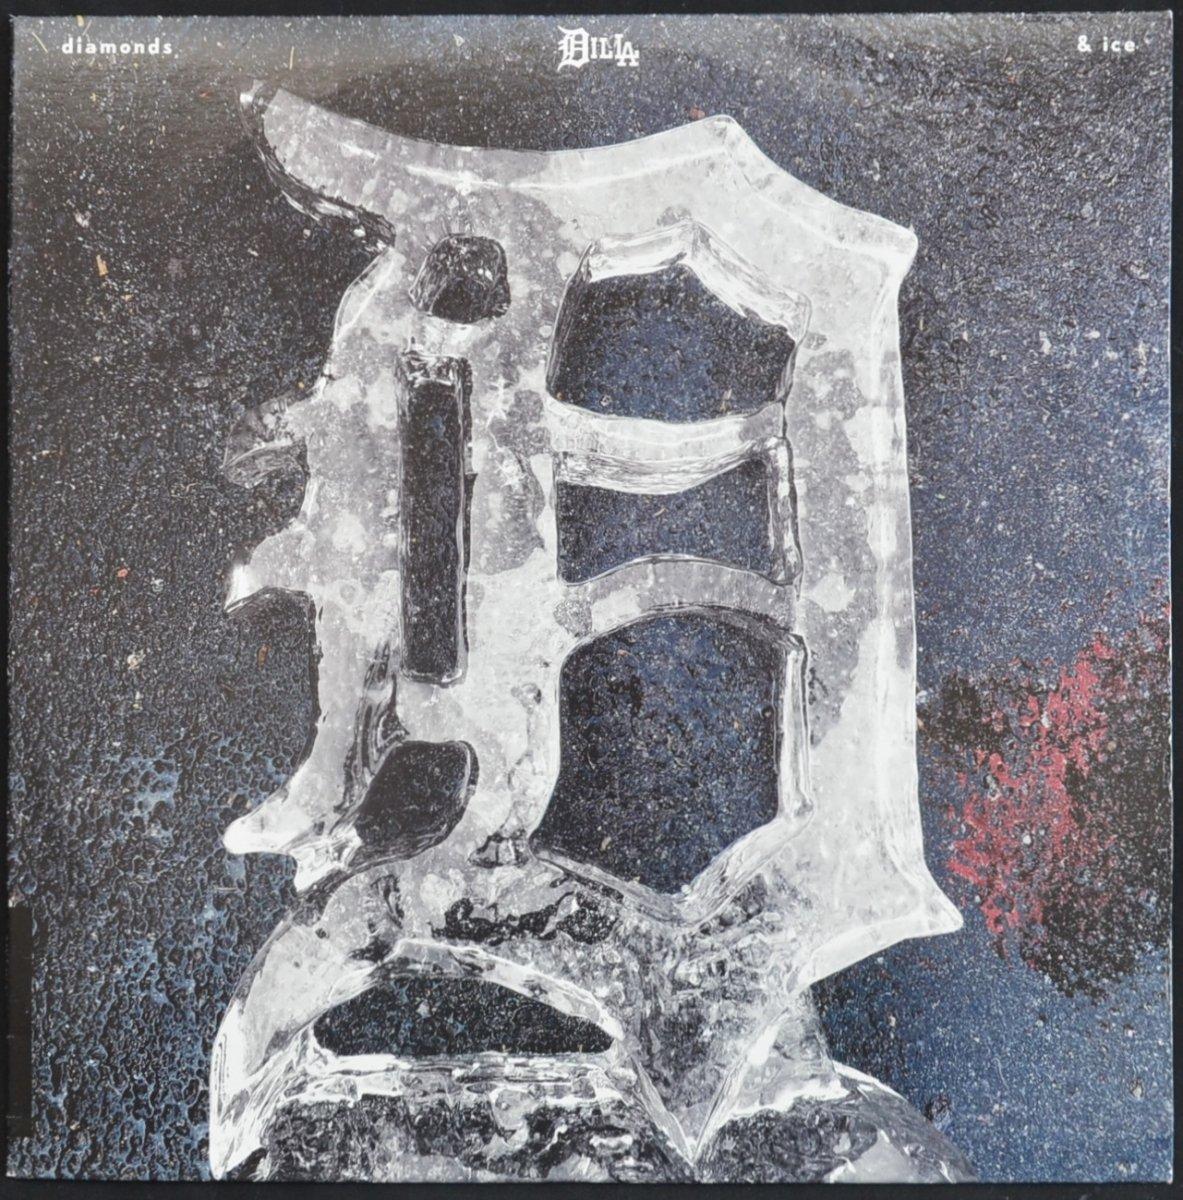 J DILLA / DIAMONDS & ICE (12